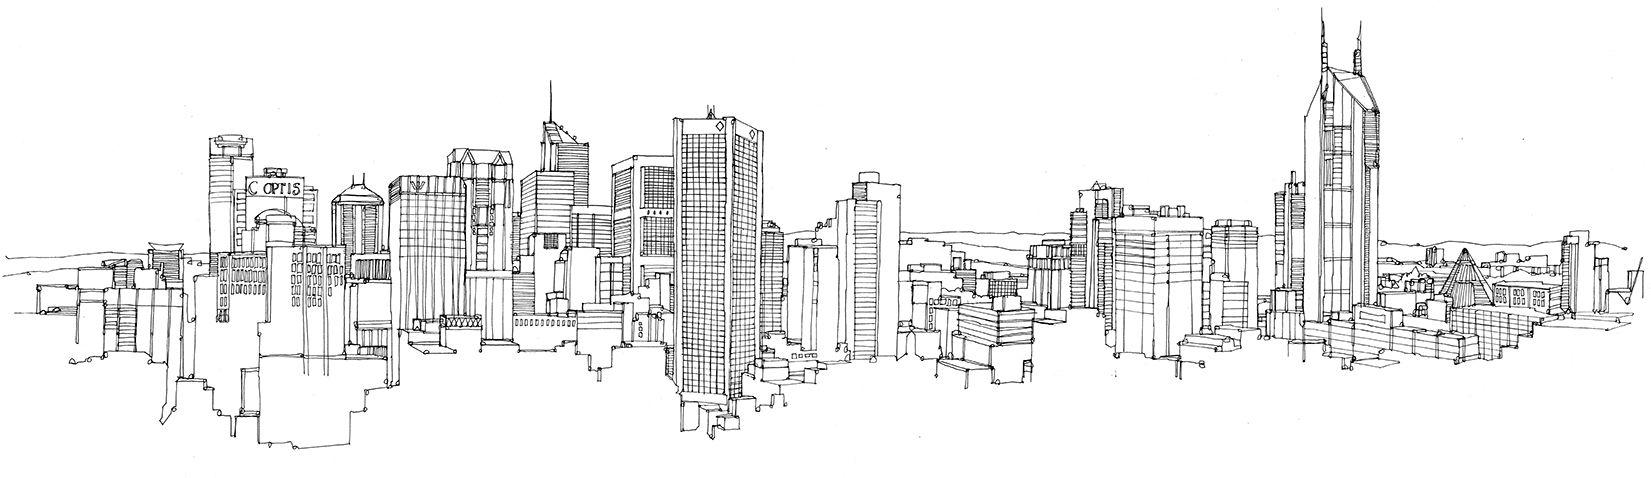 Picture Book Illustration Making An Architectural Model: Melbourne-pen.jpg (1651×478)